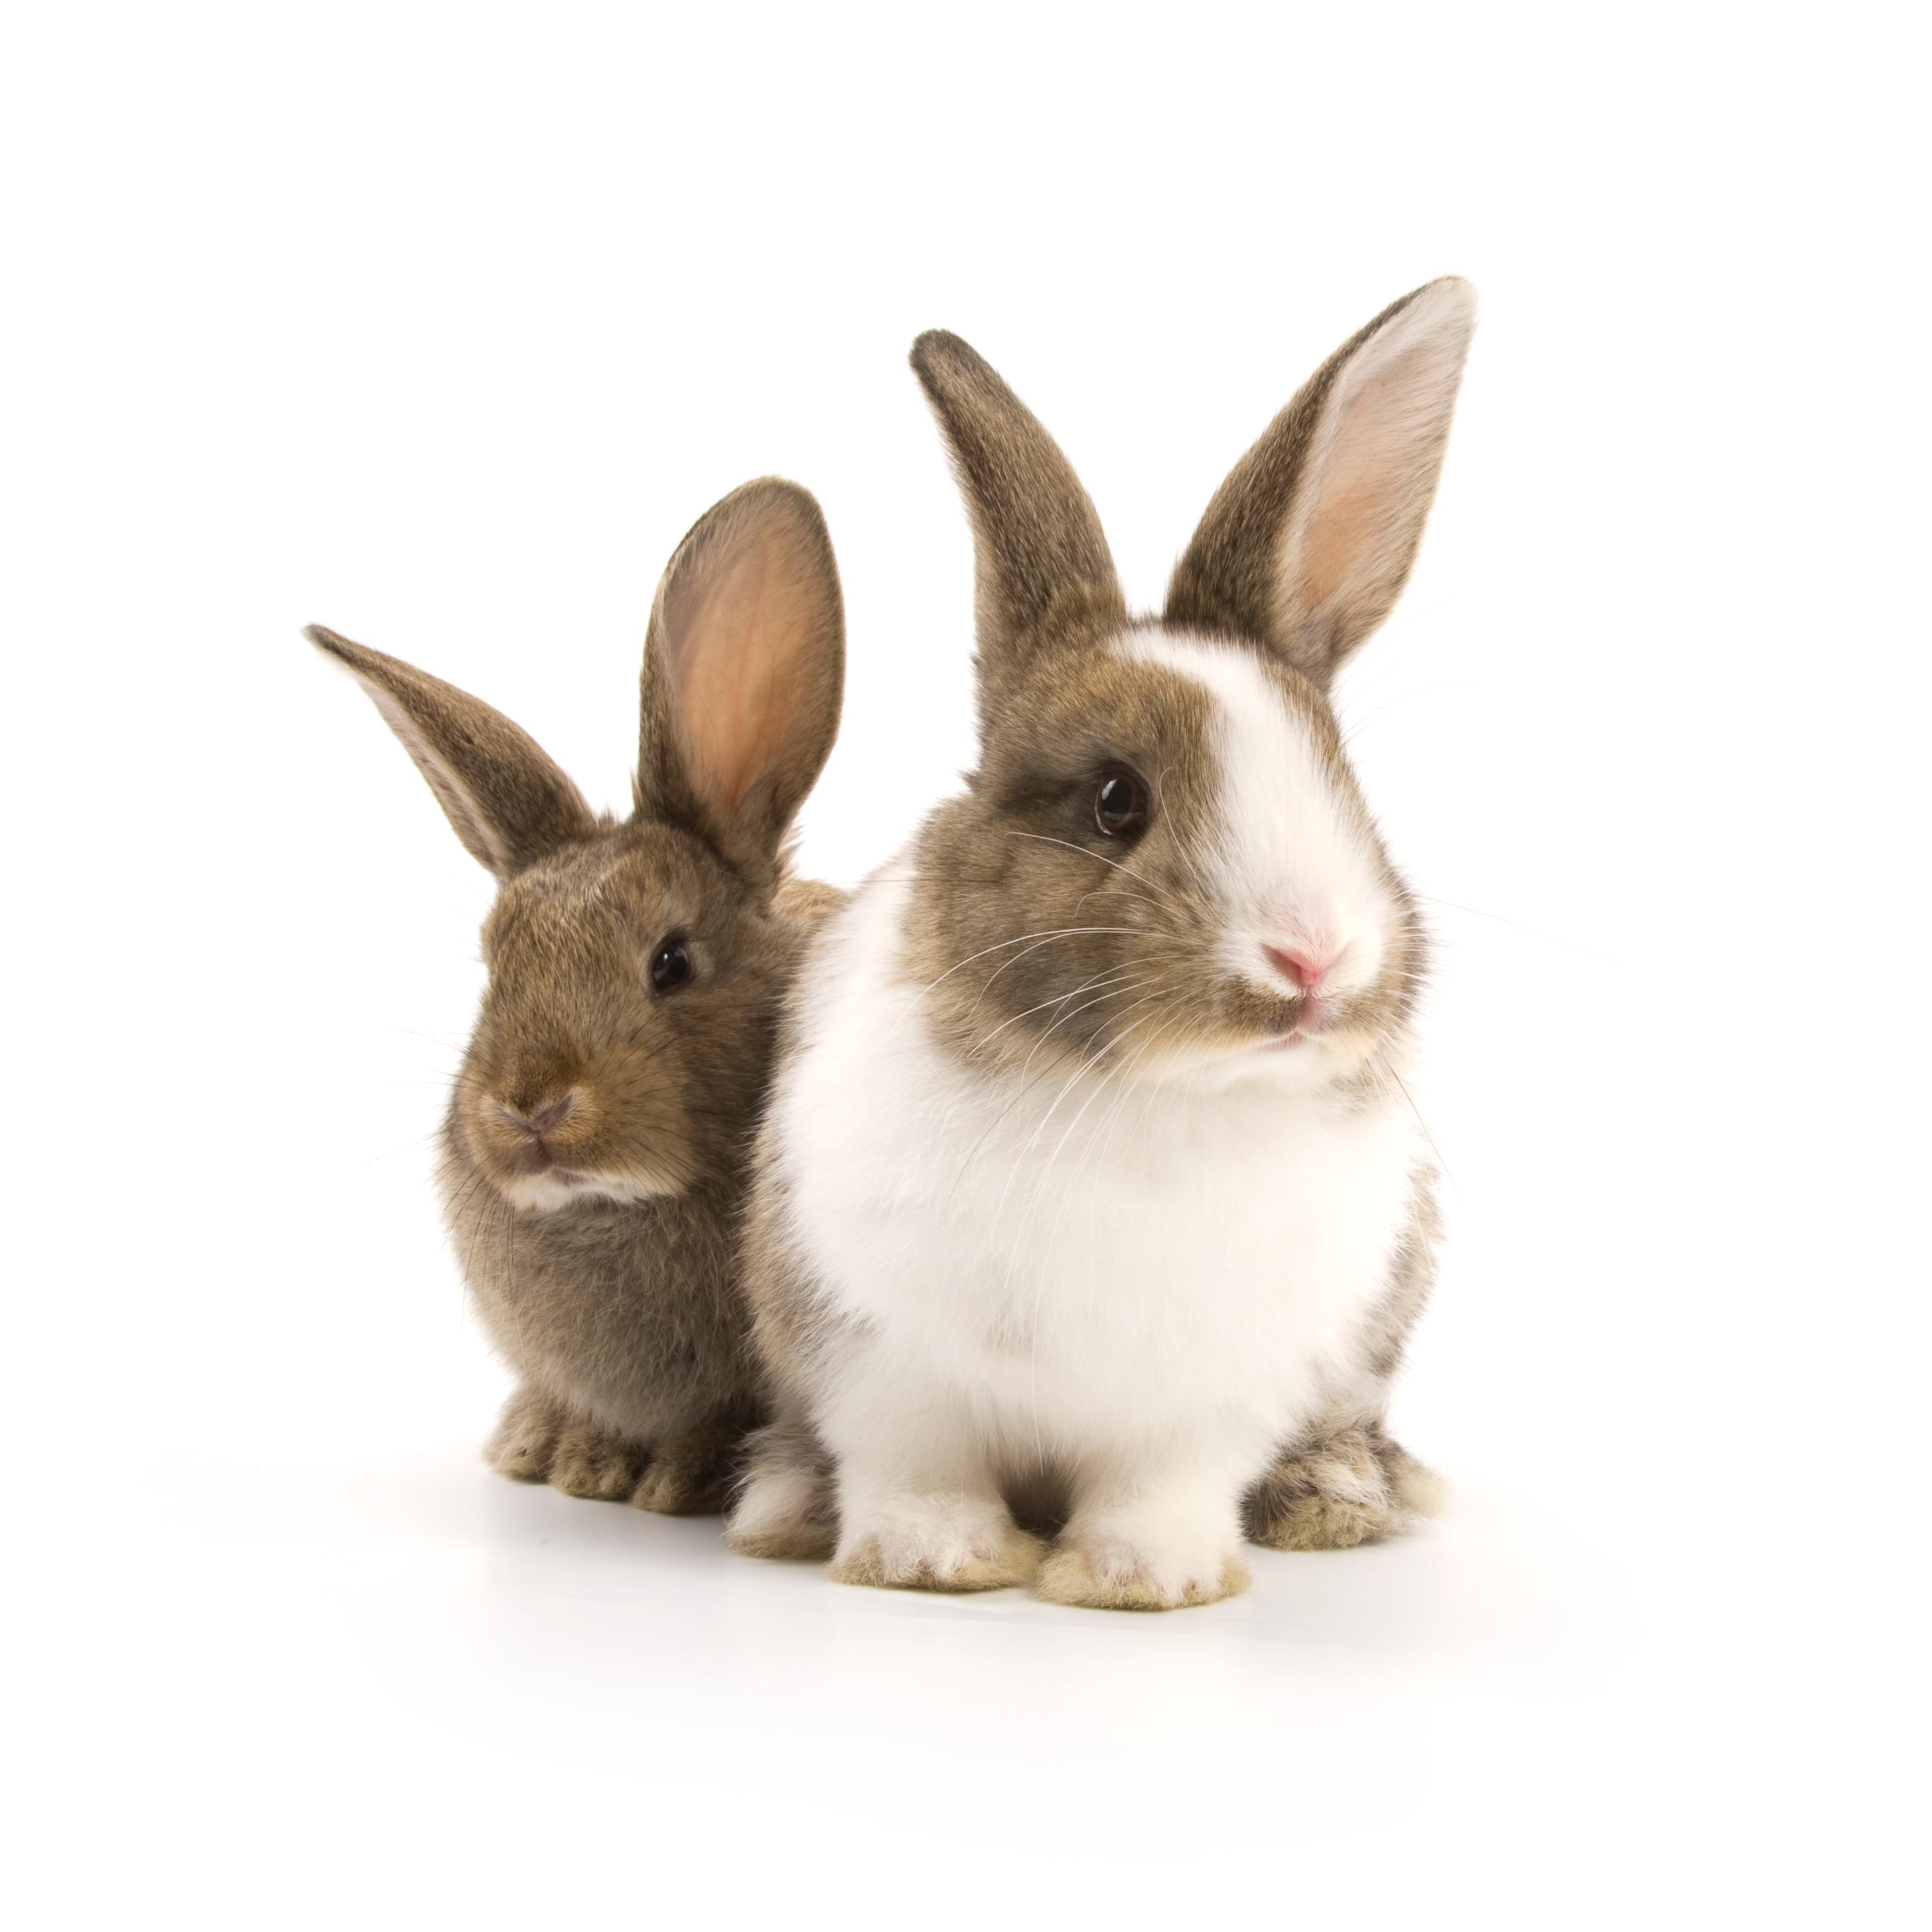 rabbits_shutterstock_57252469